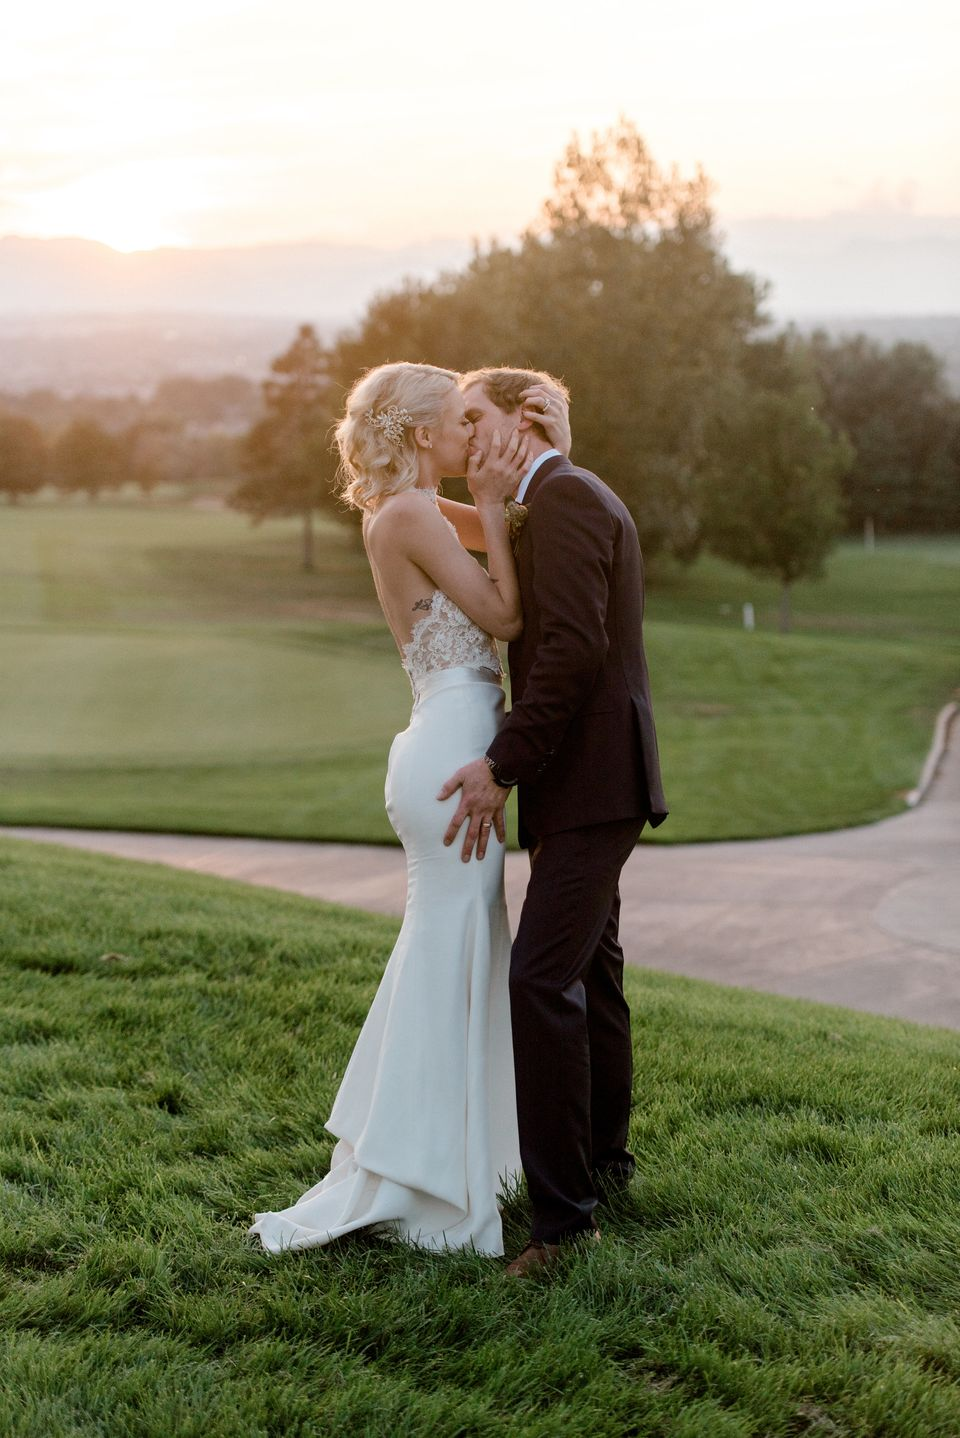 27 Romantic Wedding Photos That Capture Pure, Unadulterated